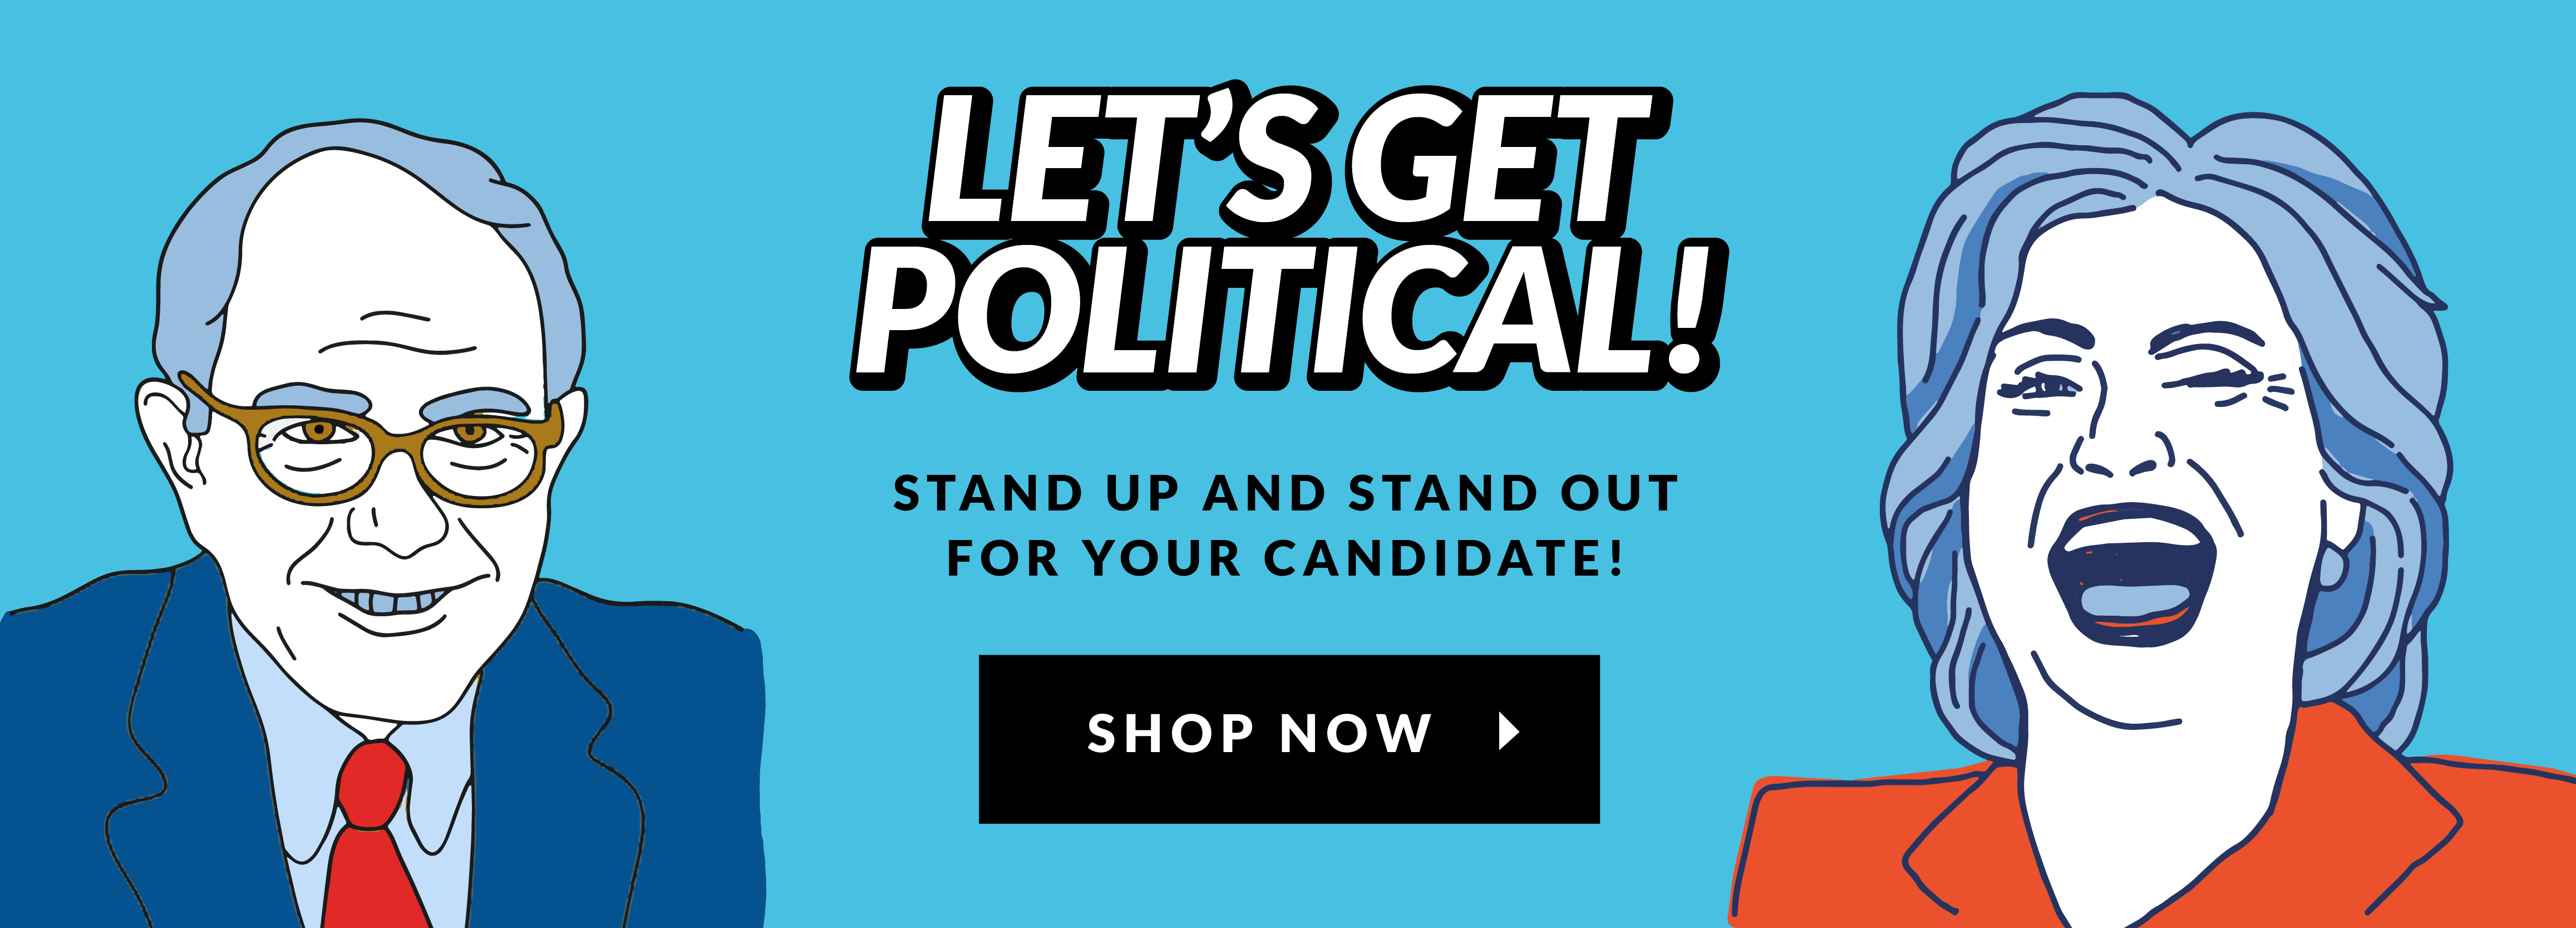 Let's Get Political - Look HUMAN